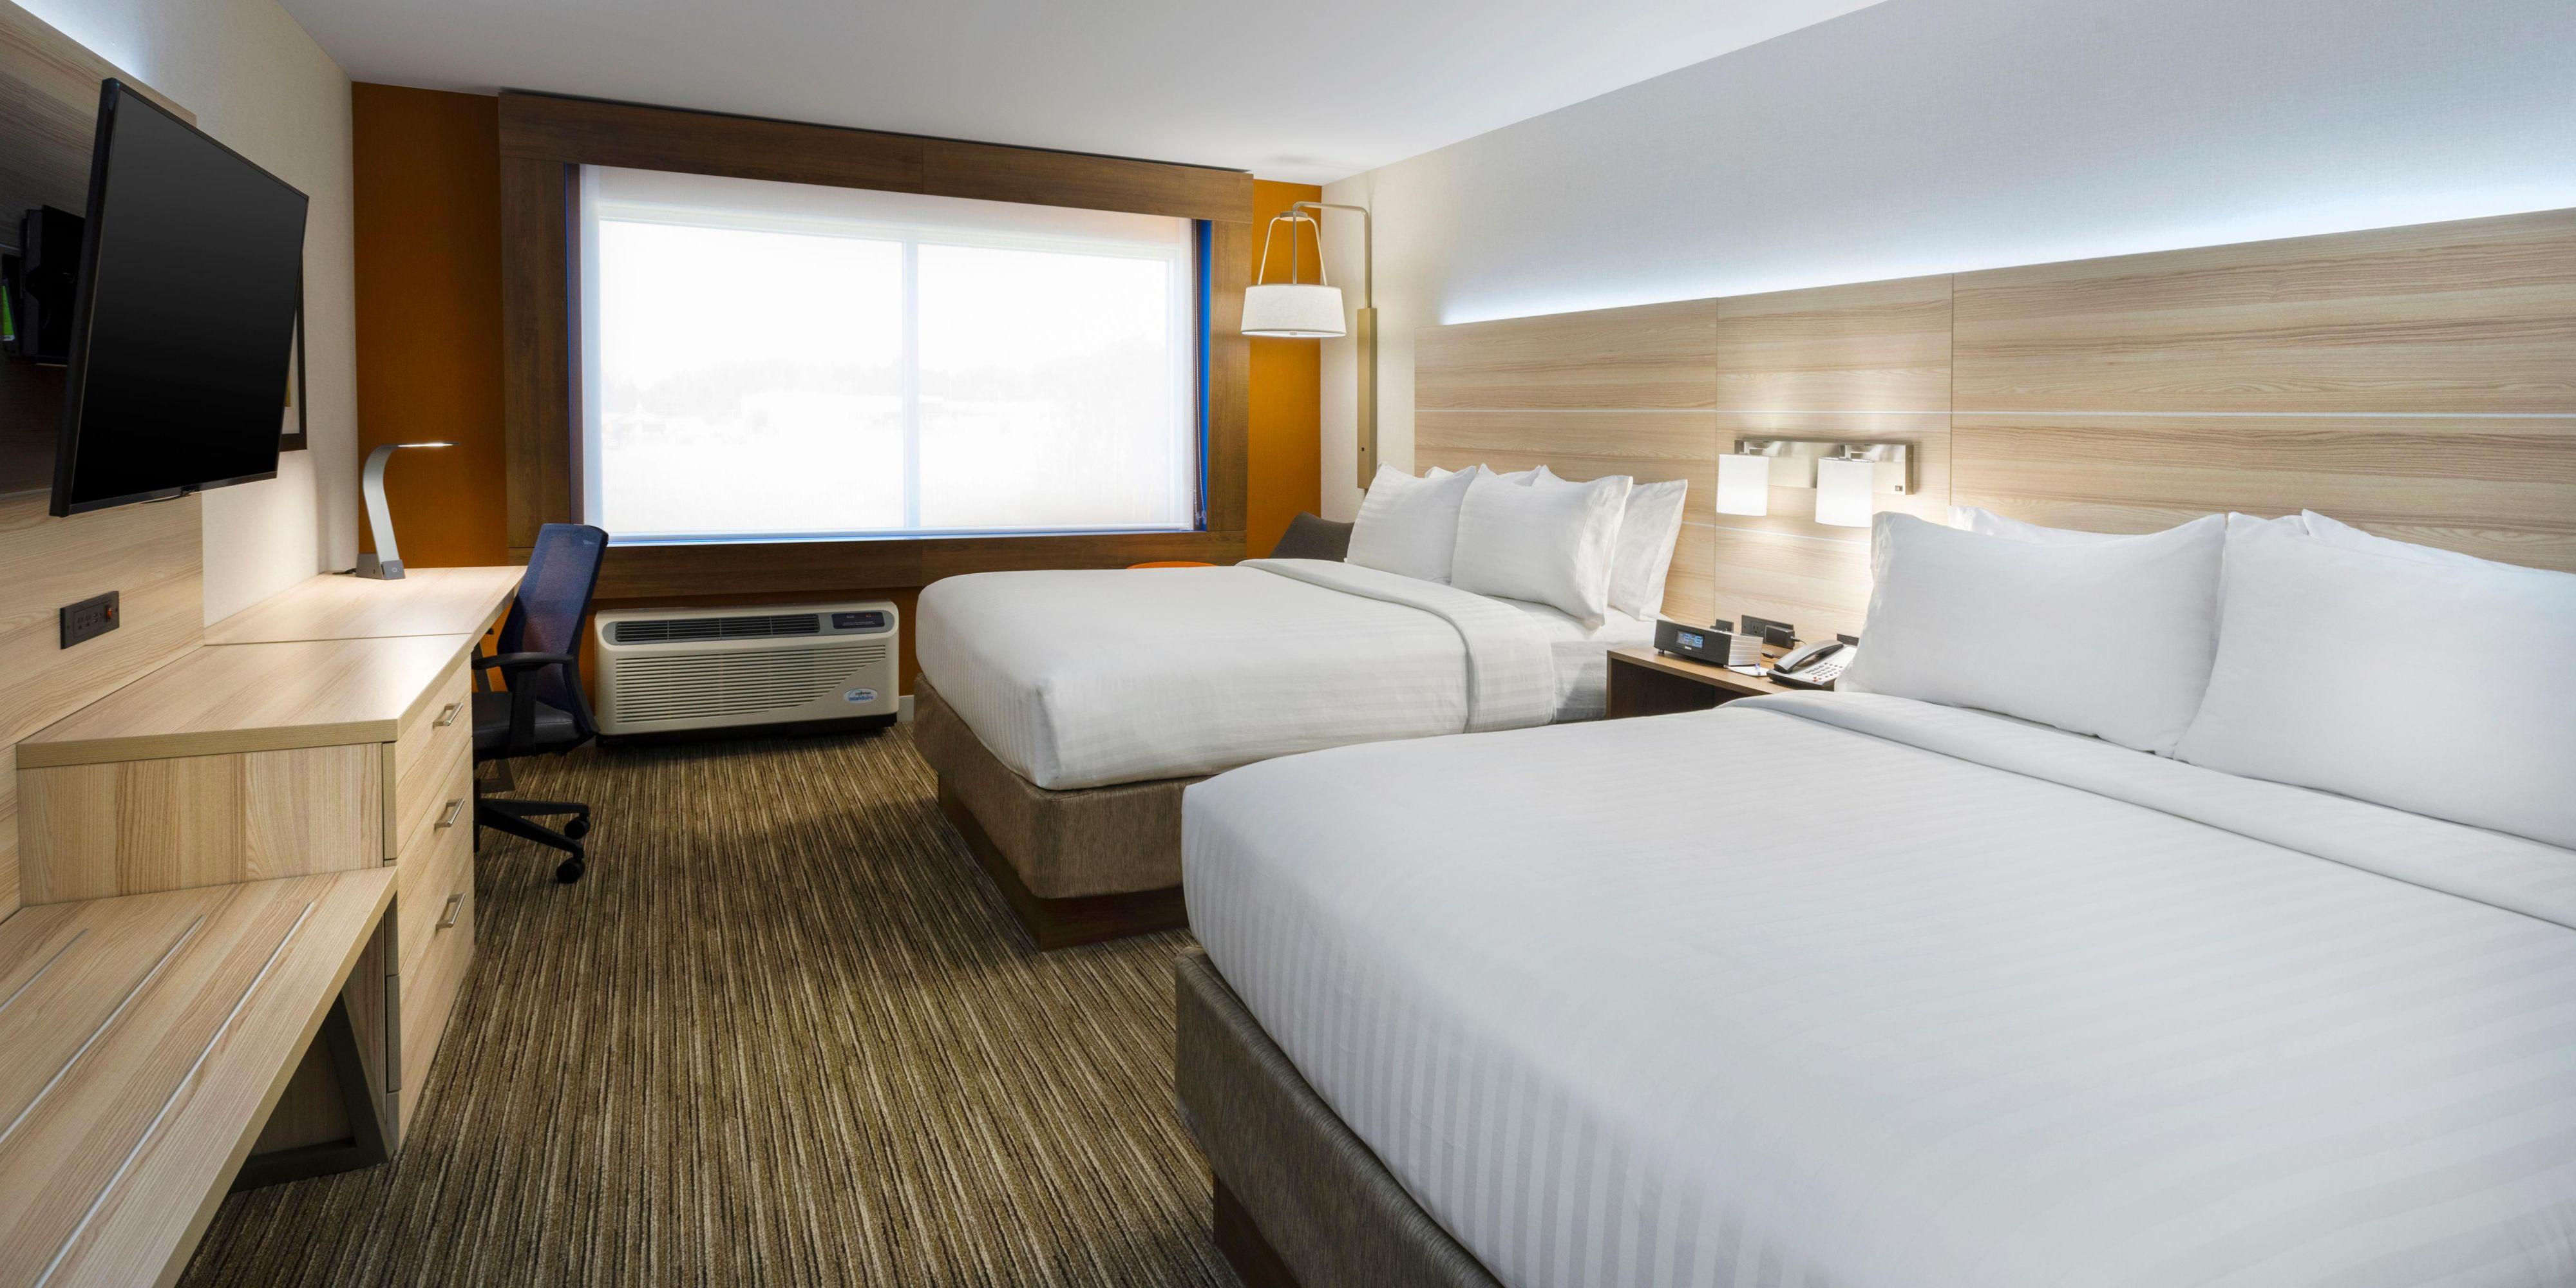 Holiday Inn Express And Suites Medina 4696607026 2x1